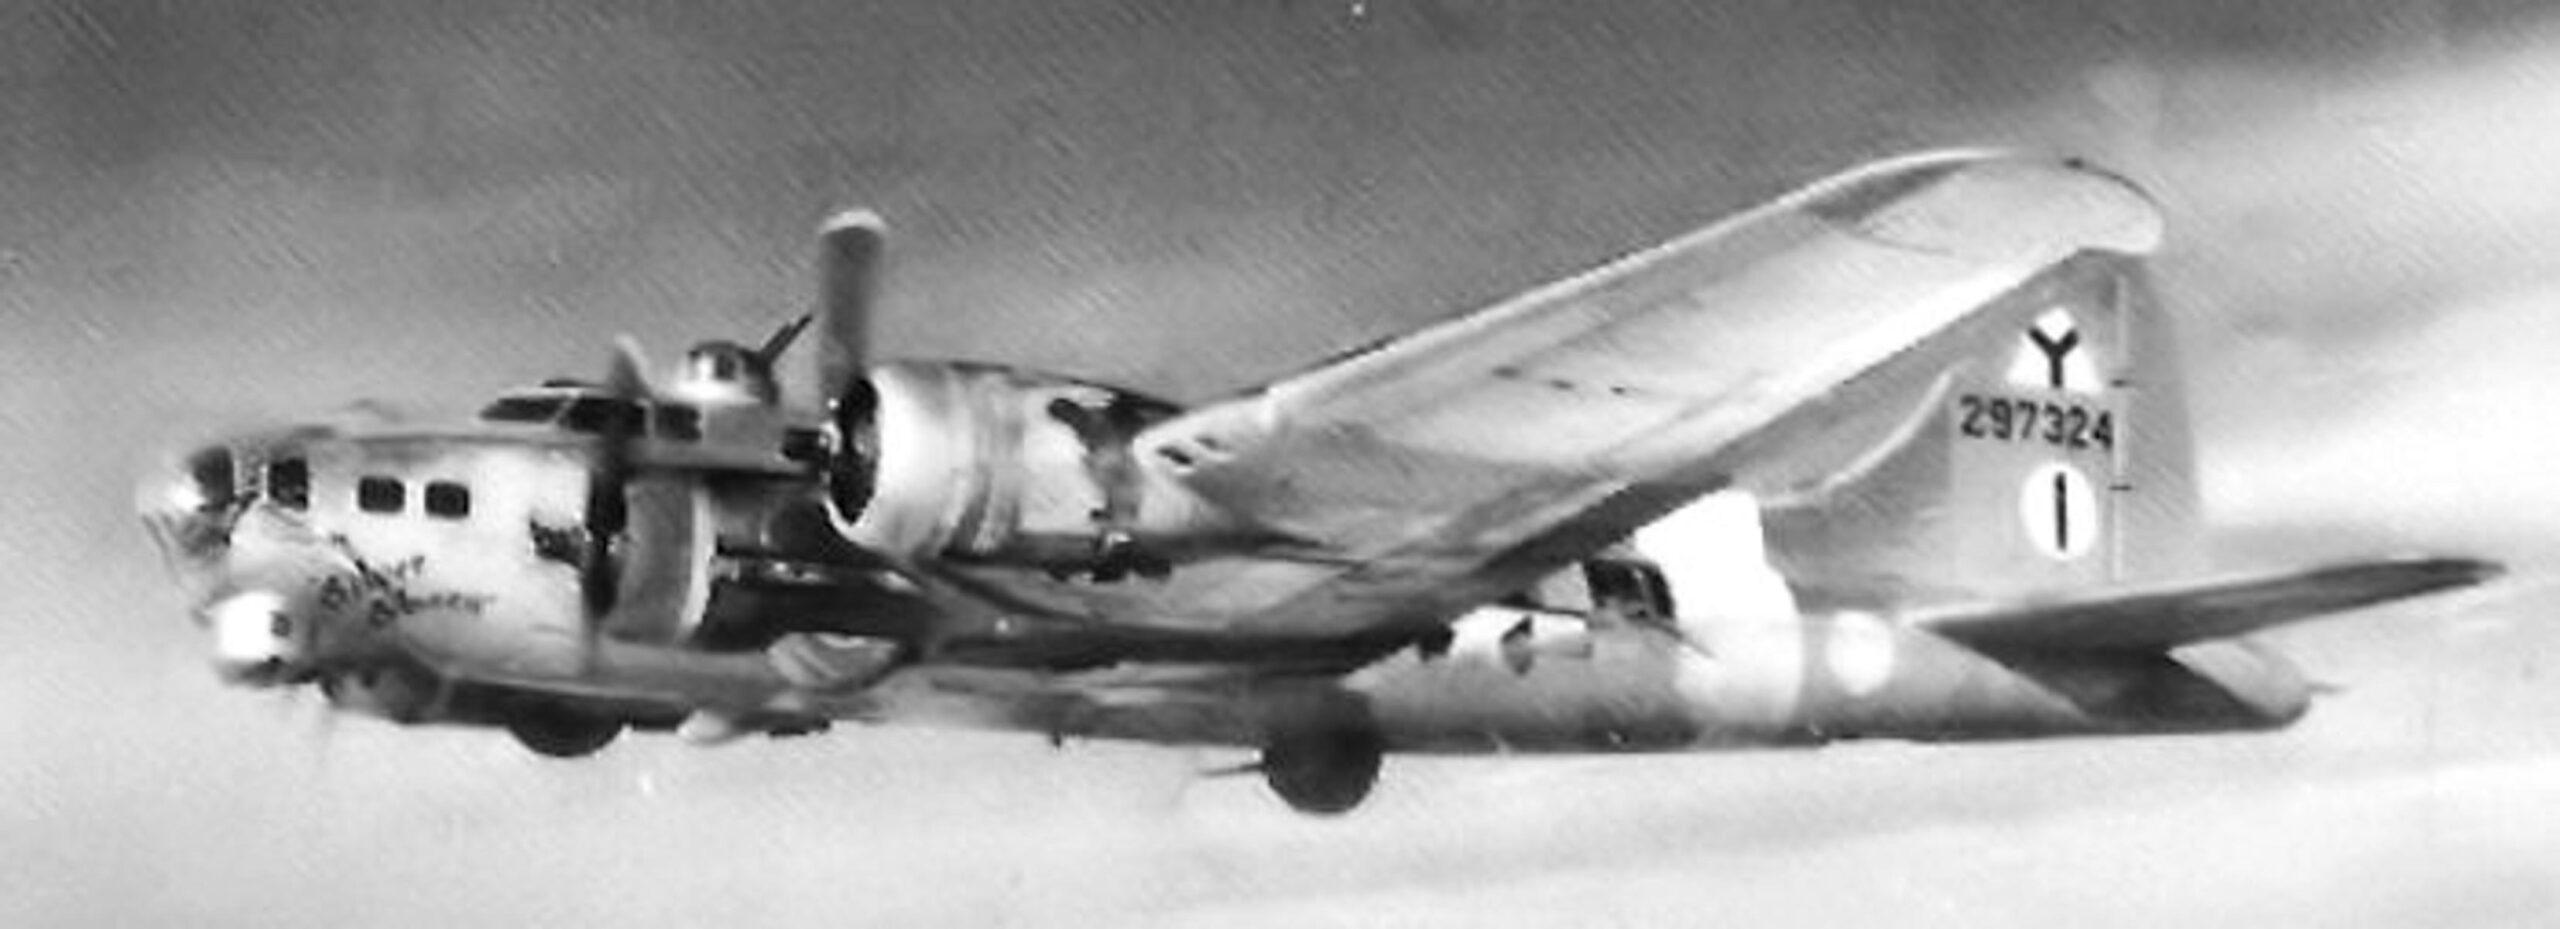 341st Bomb Squadron B-17